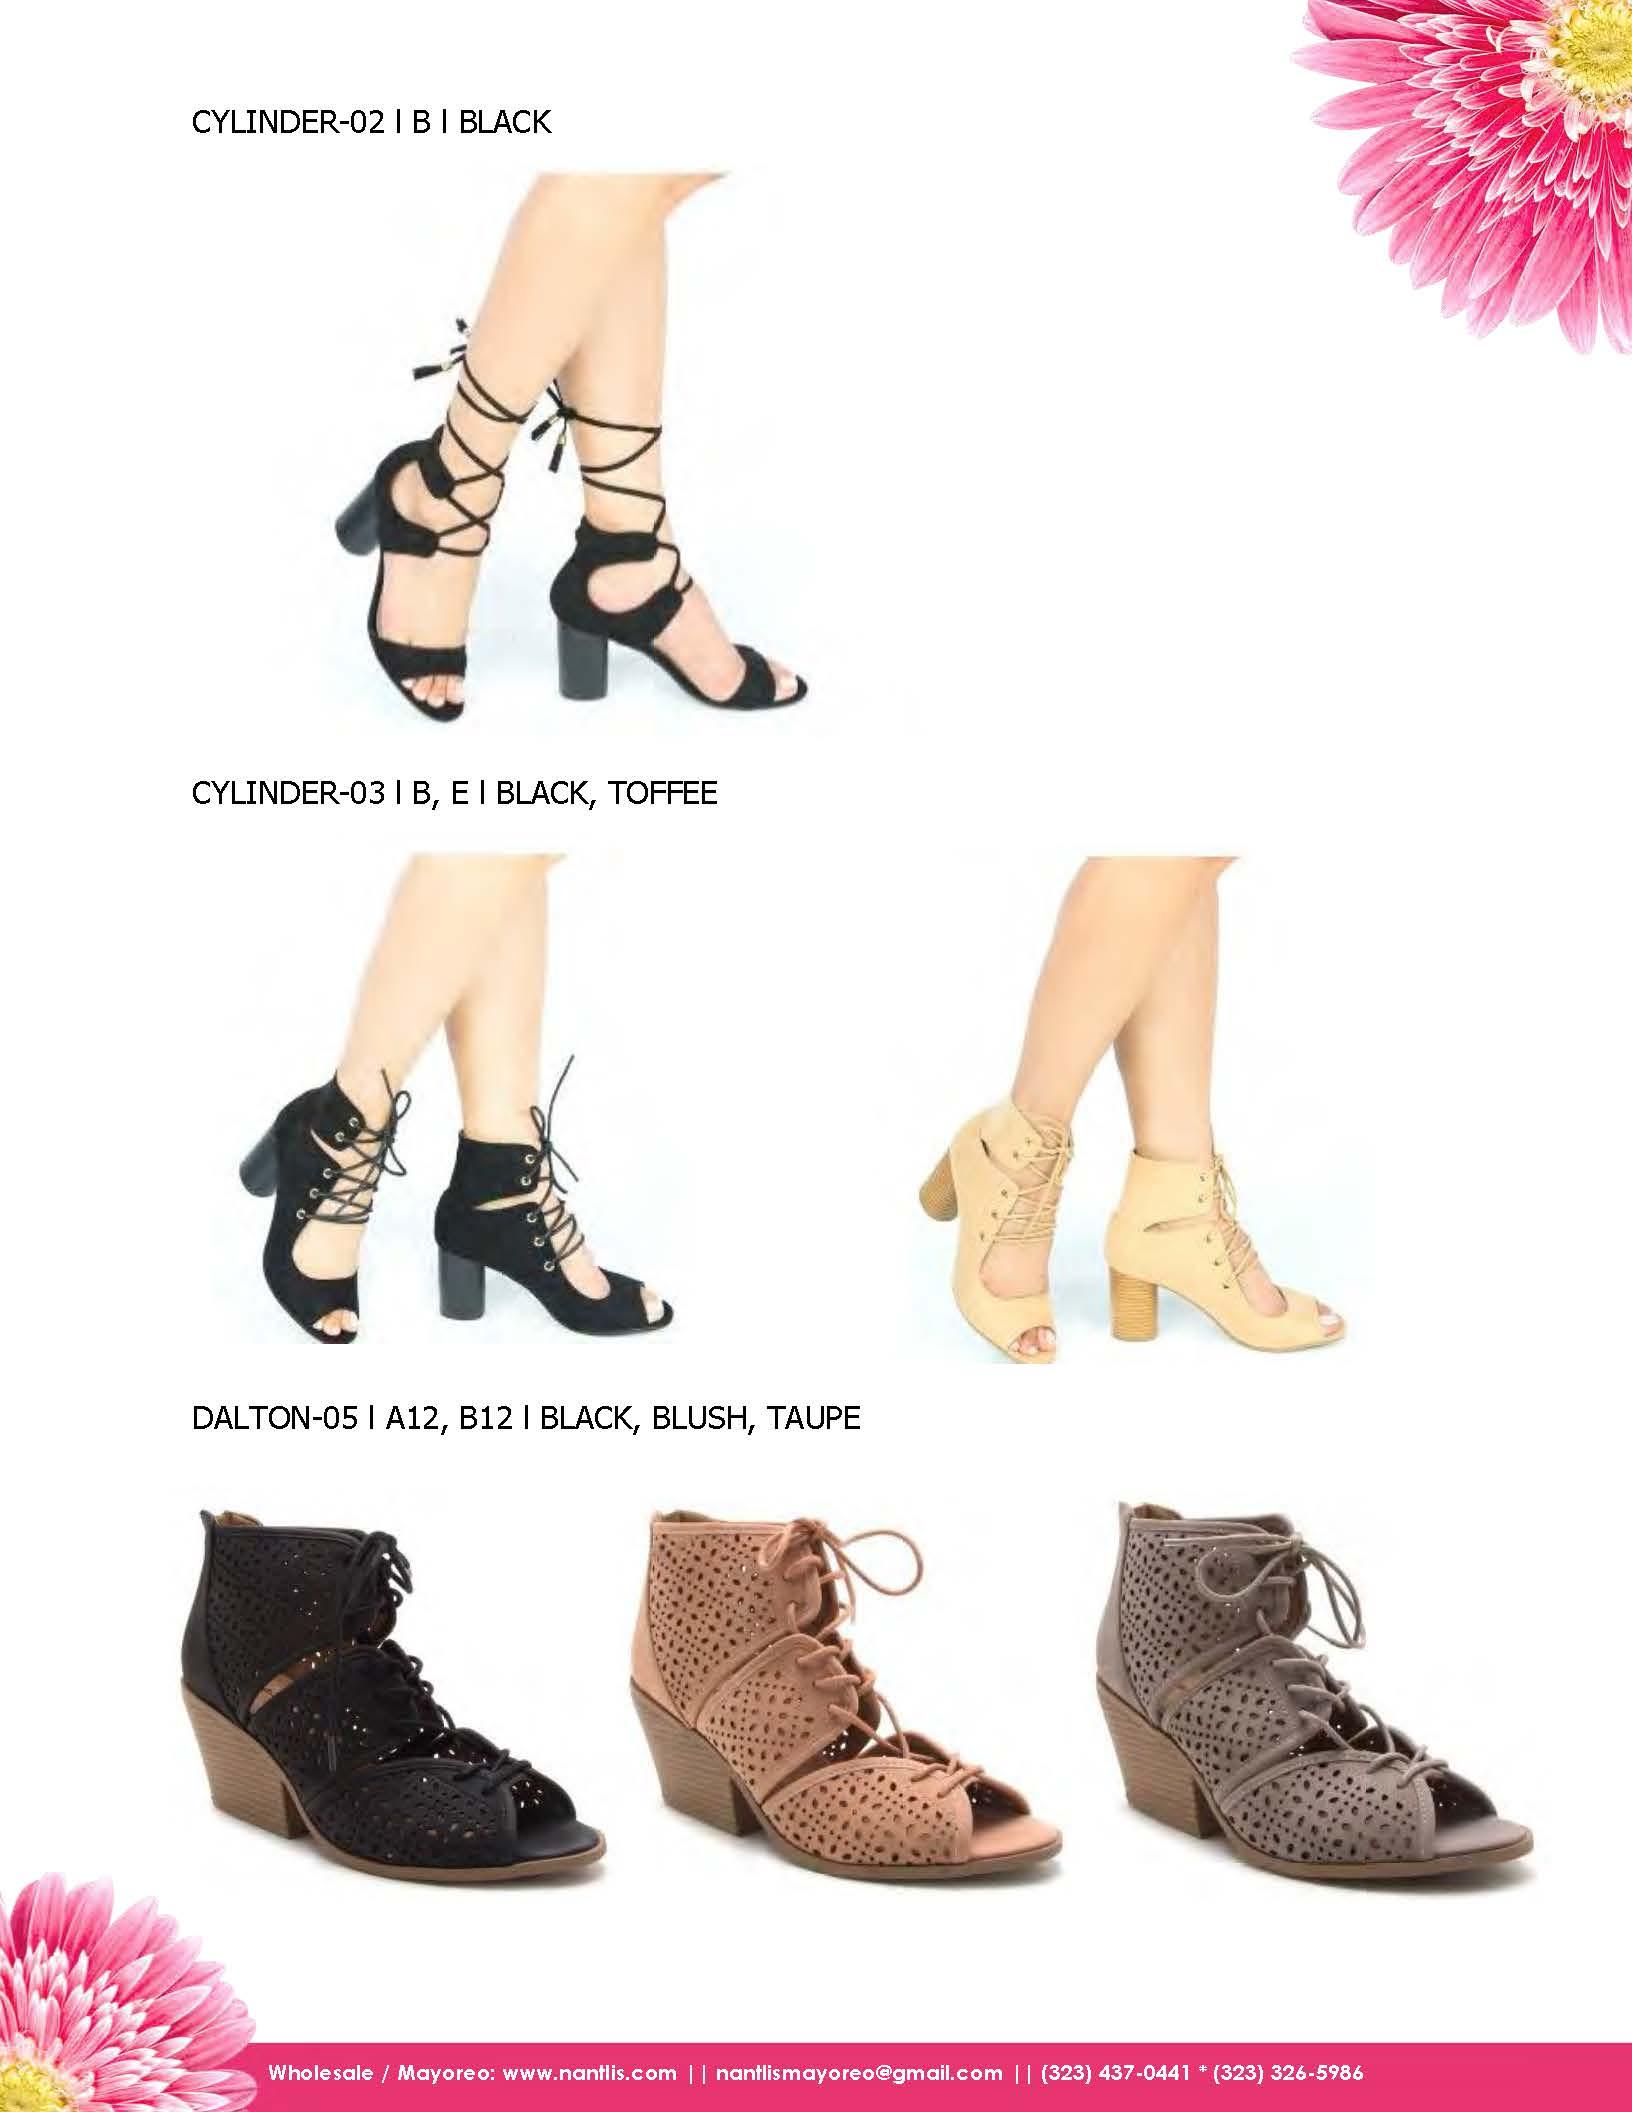 Nantlis Vol QU43 Zapatos para mujer mayoreo Wholesale shoes for women_Page_17